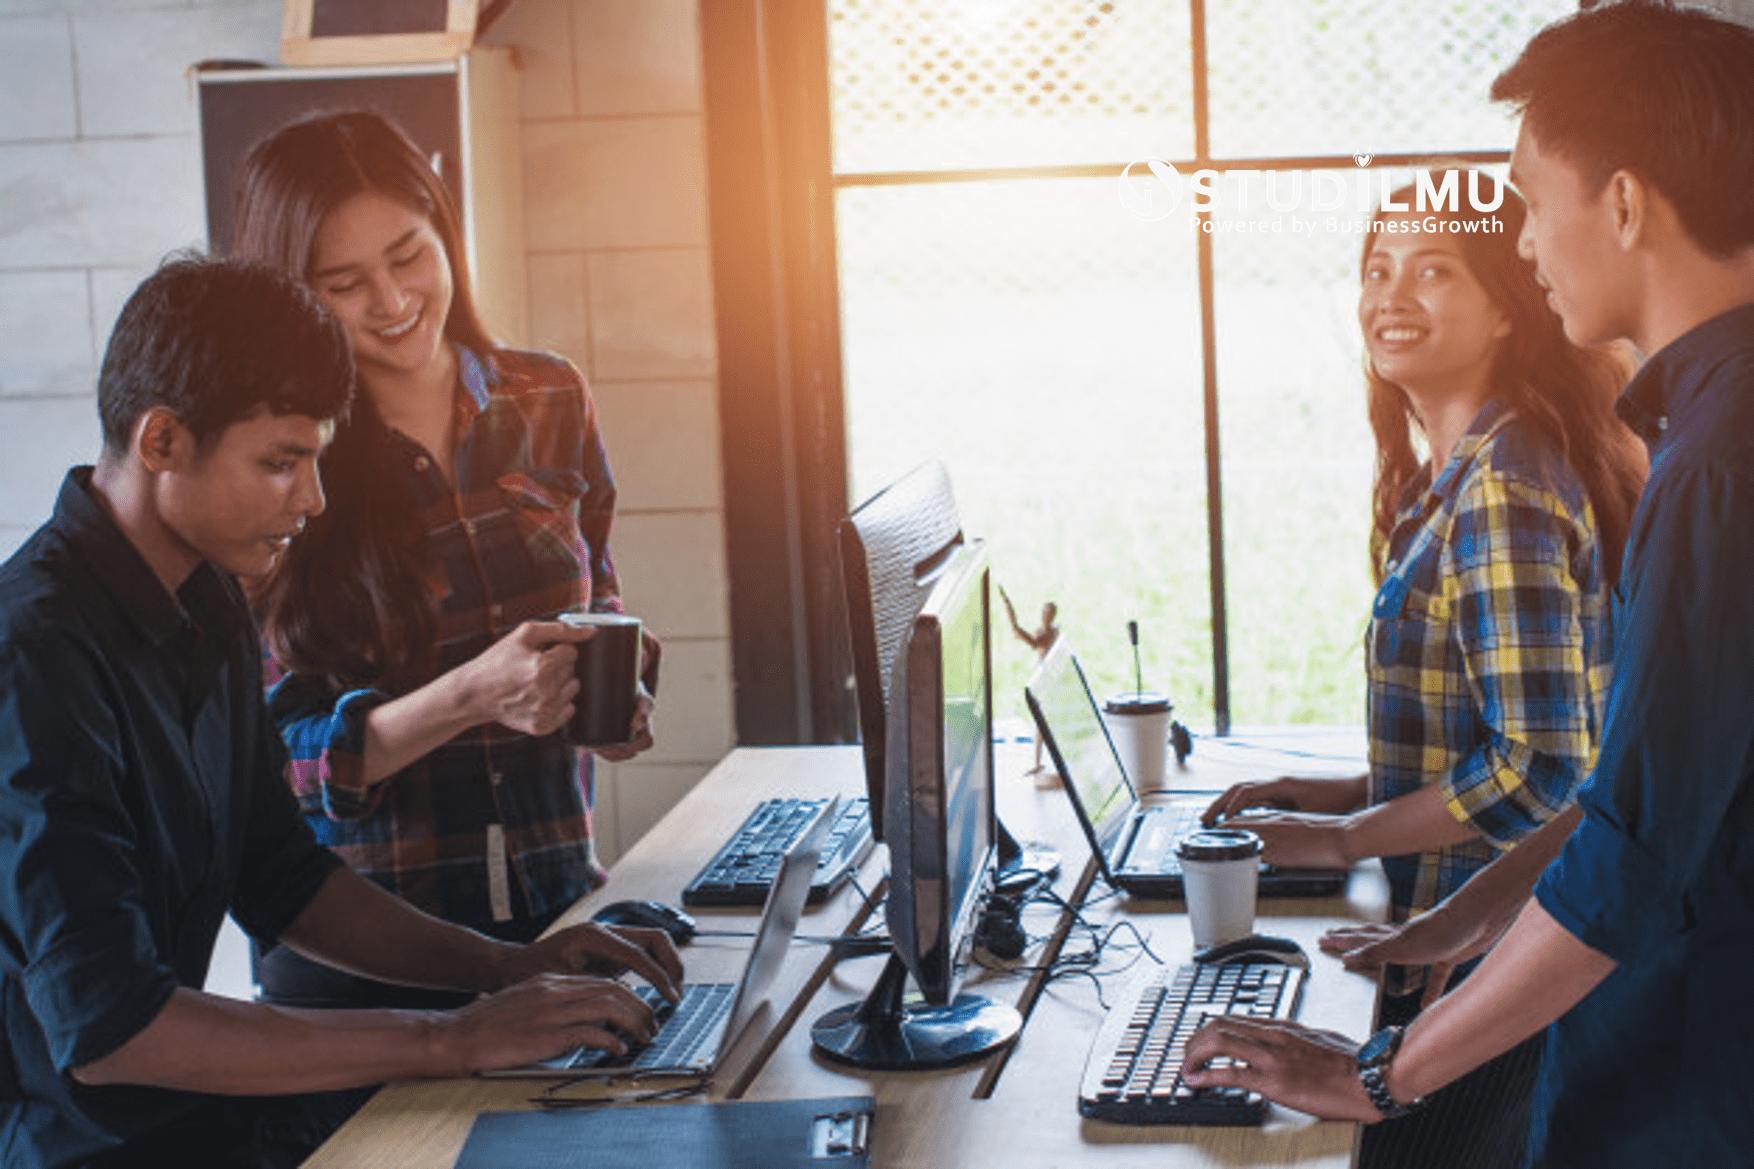 STUDILMU Career Advice - 5 Cara Menghadapi Rekan Kerja yang Lebih Muda